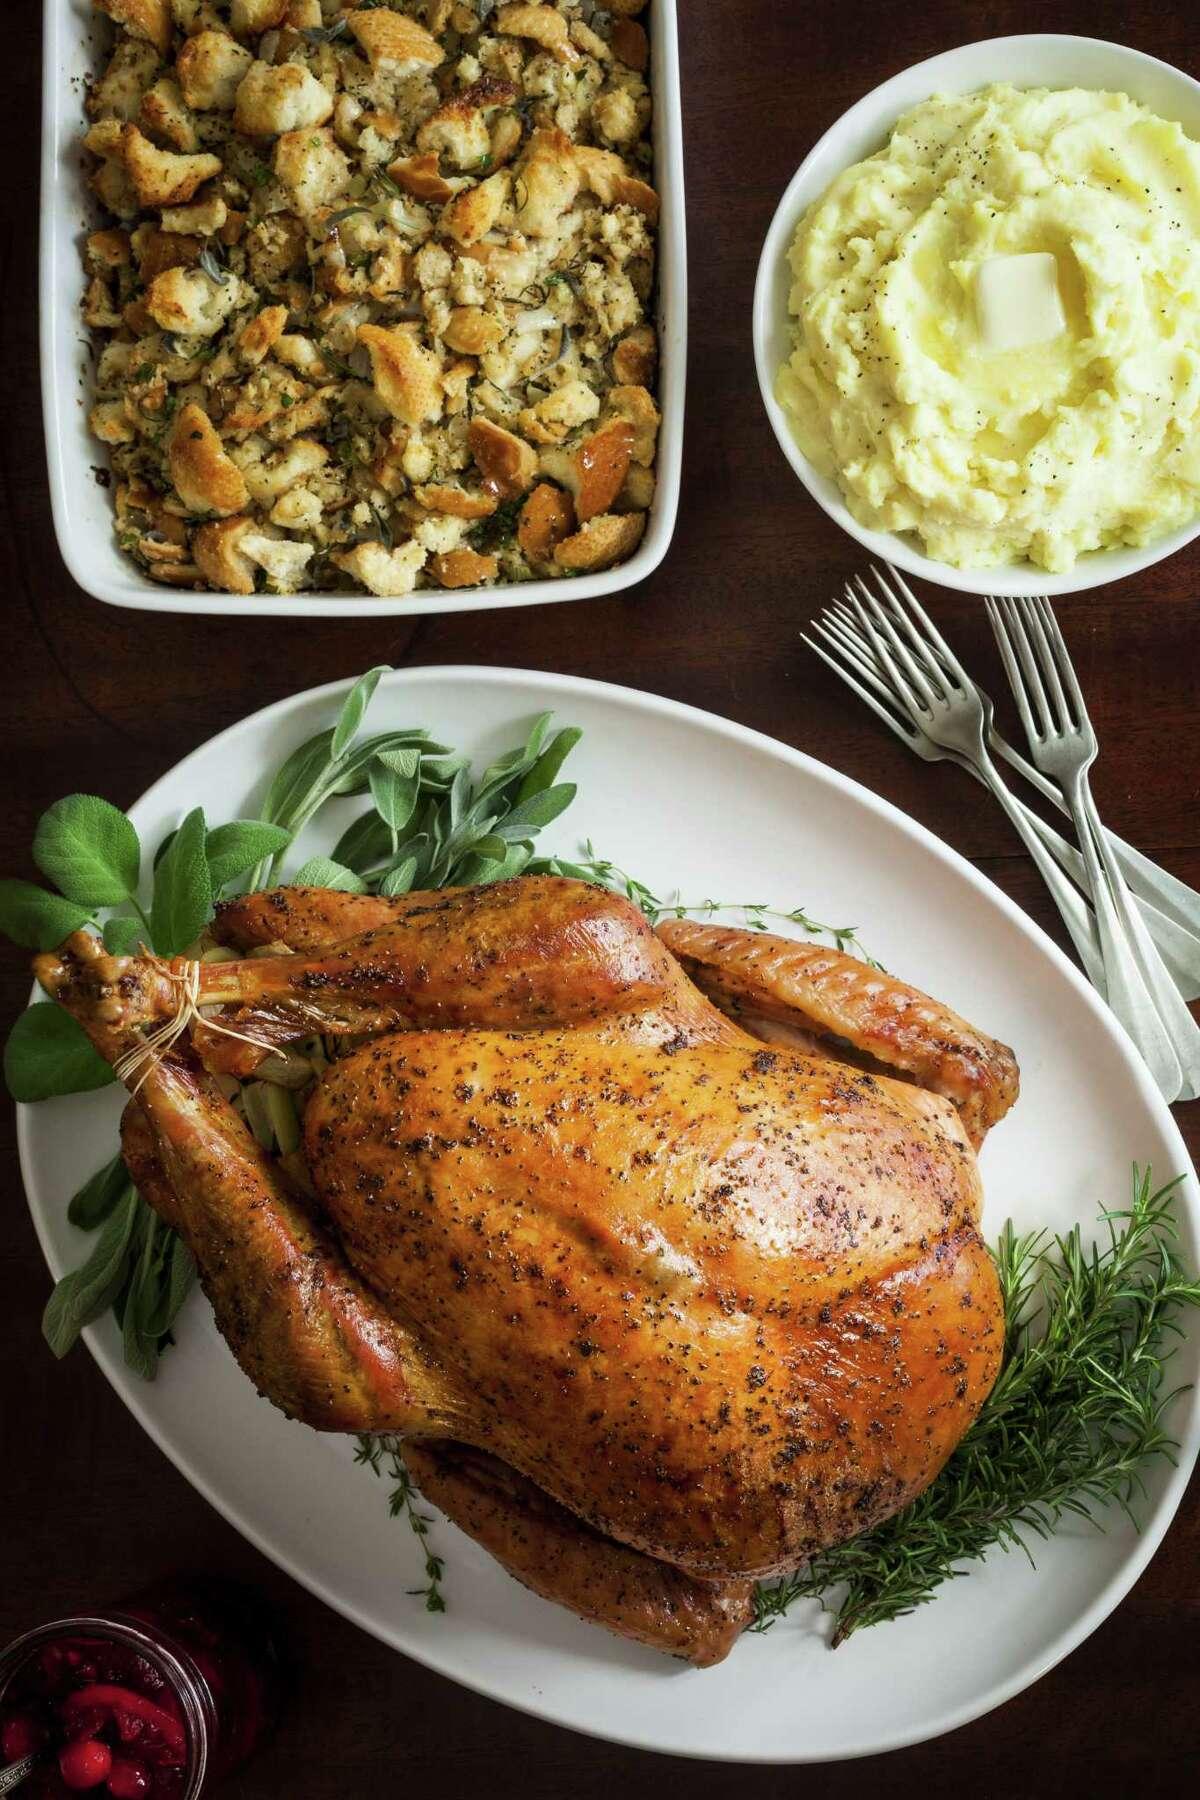 Thanksgiving dinner photographed, Monday, Nov. 5, 2012, in Houston. Food stylist Carla Buerkle. ( Michael Paulsen / Houston Chronicle )